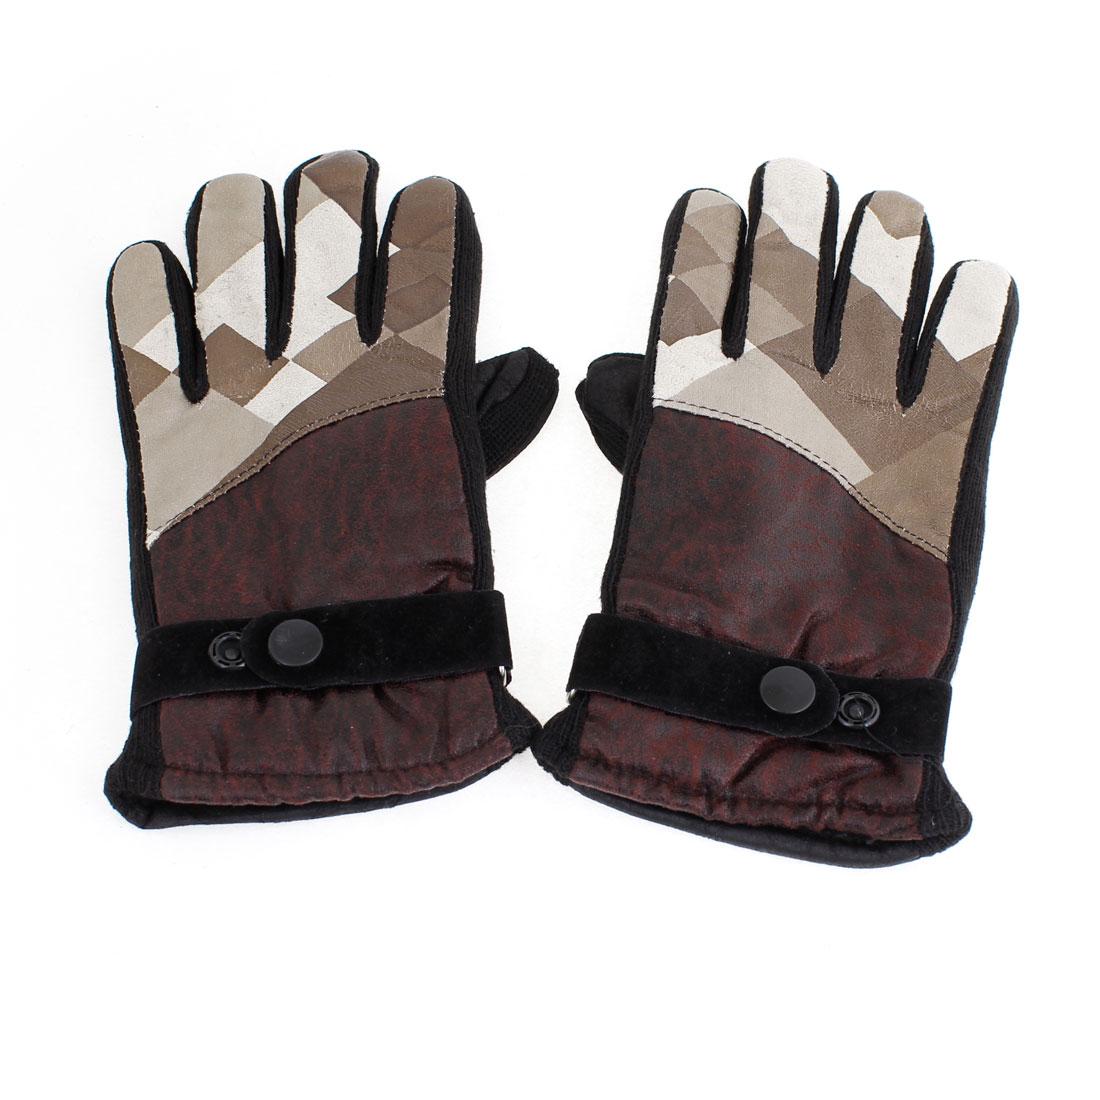 Ladies Fleece Lining Full Finger Winter Bicycle Gloves Burgundy Khaki Pair